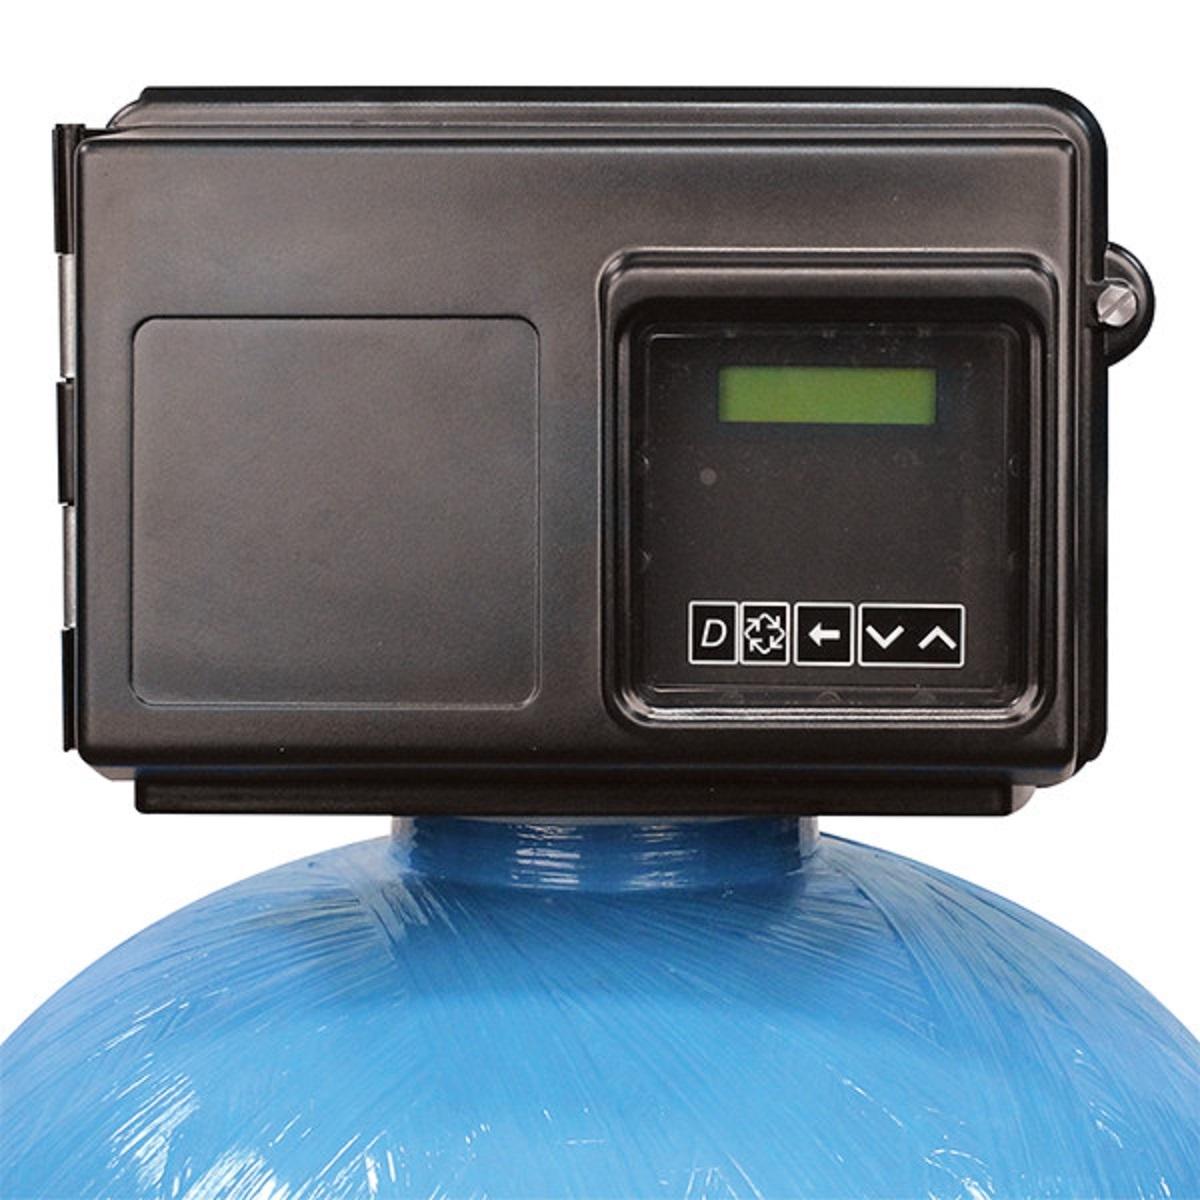 Fleck 2850 1700 1 1 2 Quot Meter Valve With 3c Injector